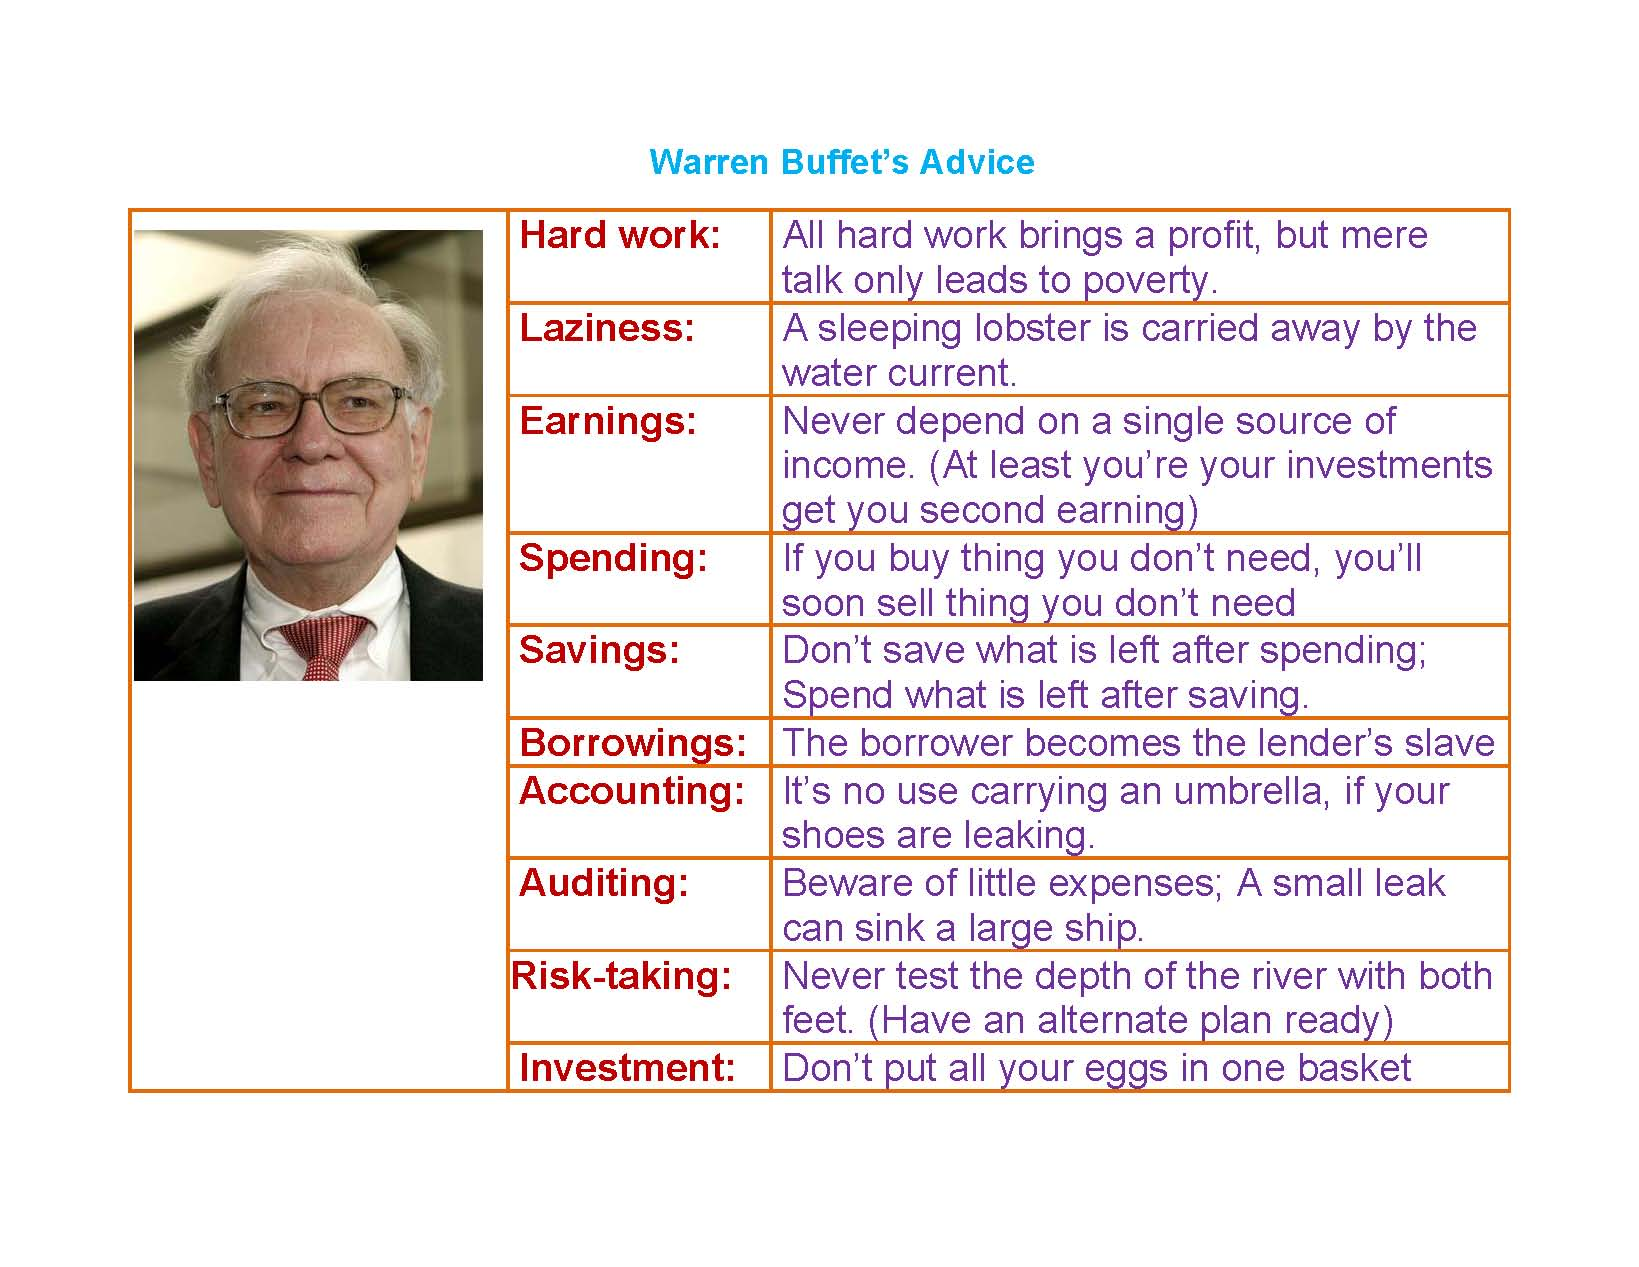 warren-buffets-advice-for-2009-2